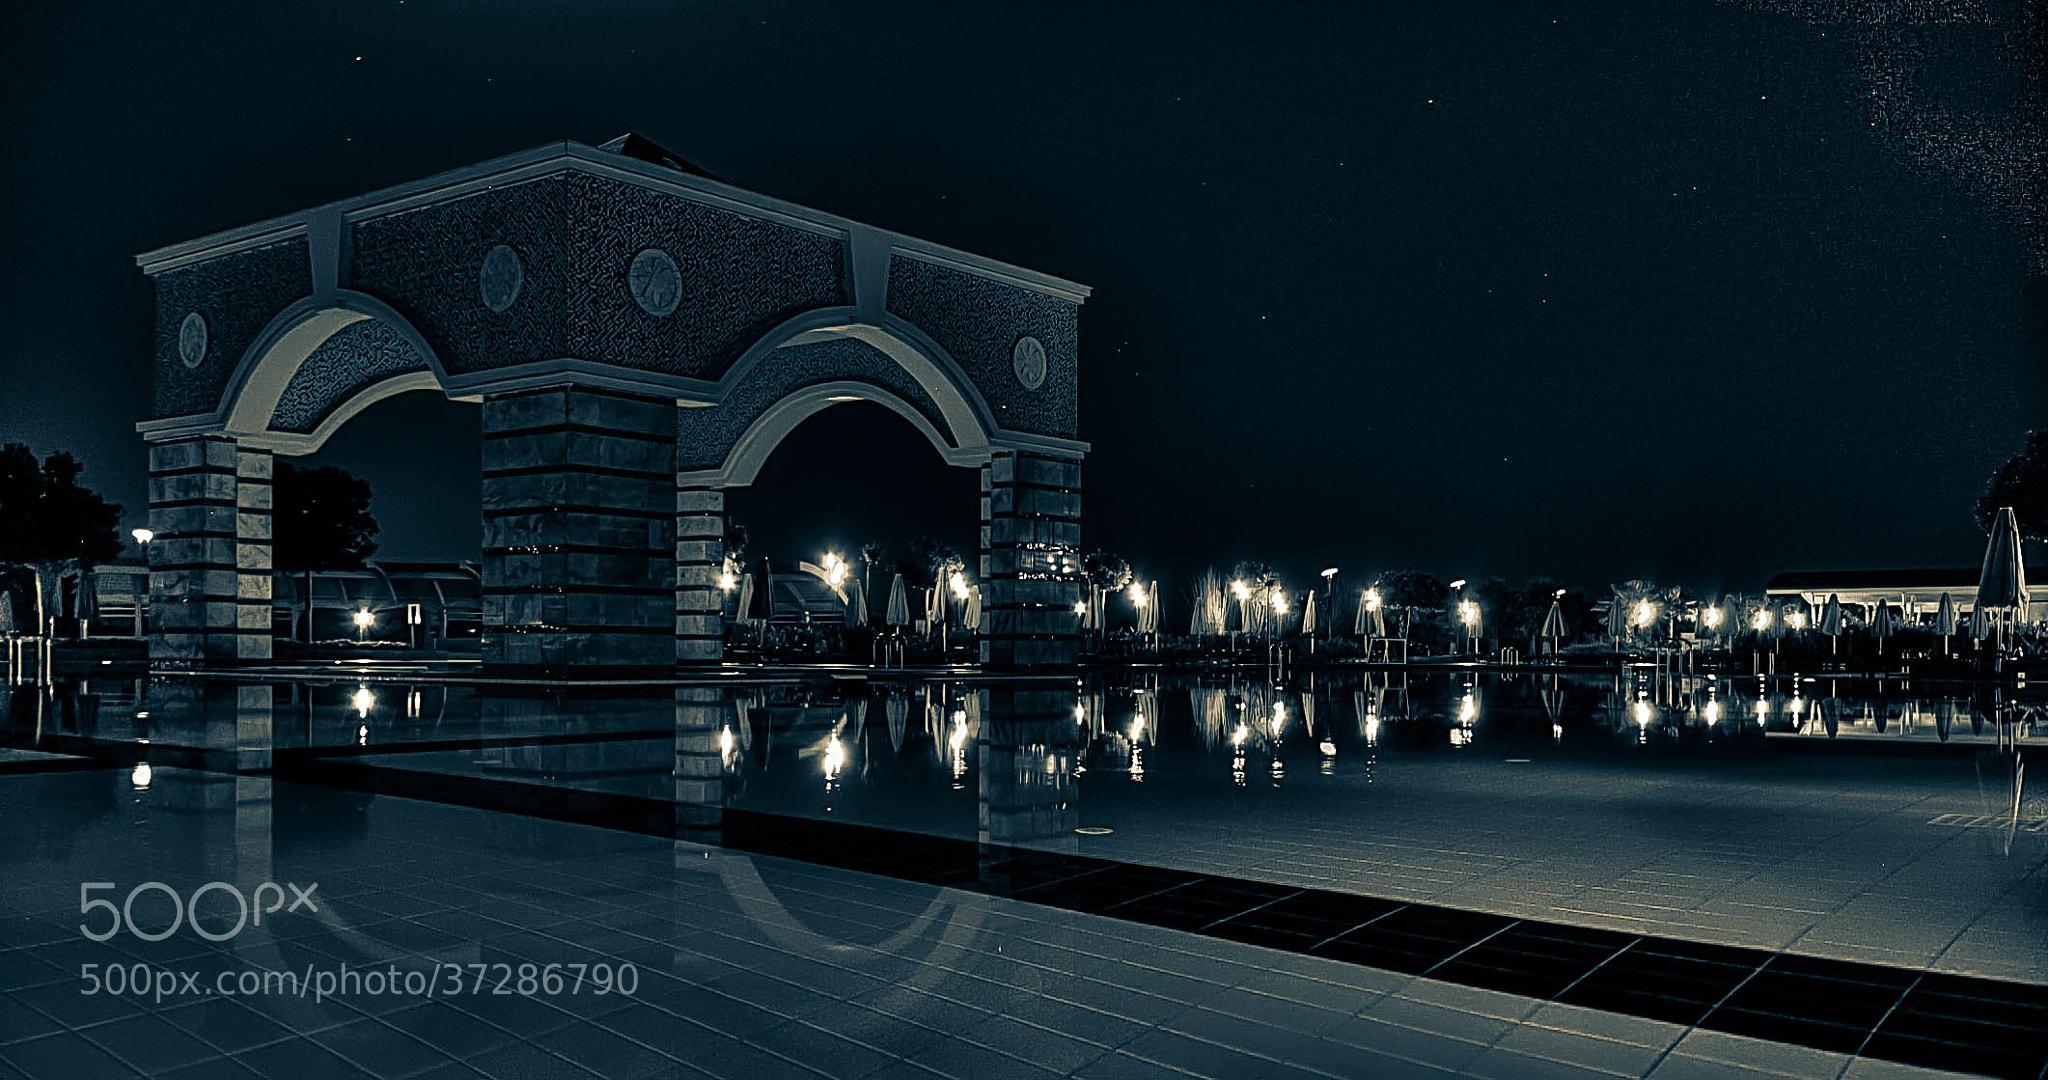 Photograph Azul Stars by Ali KoRdZaDeh on 500px